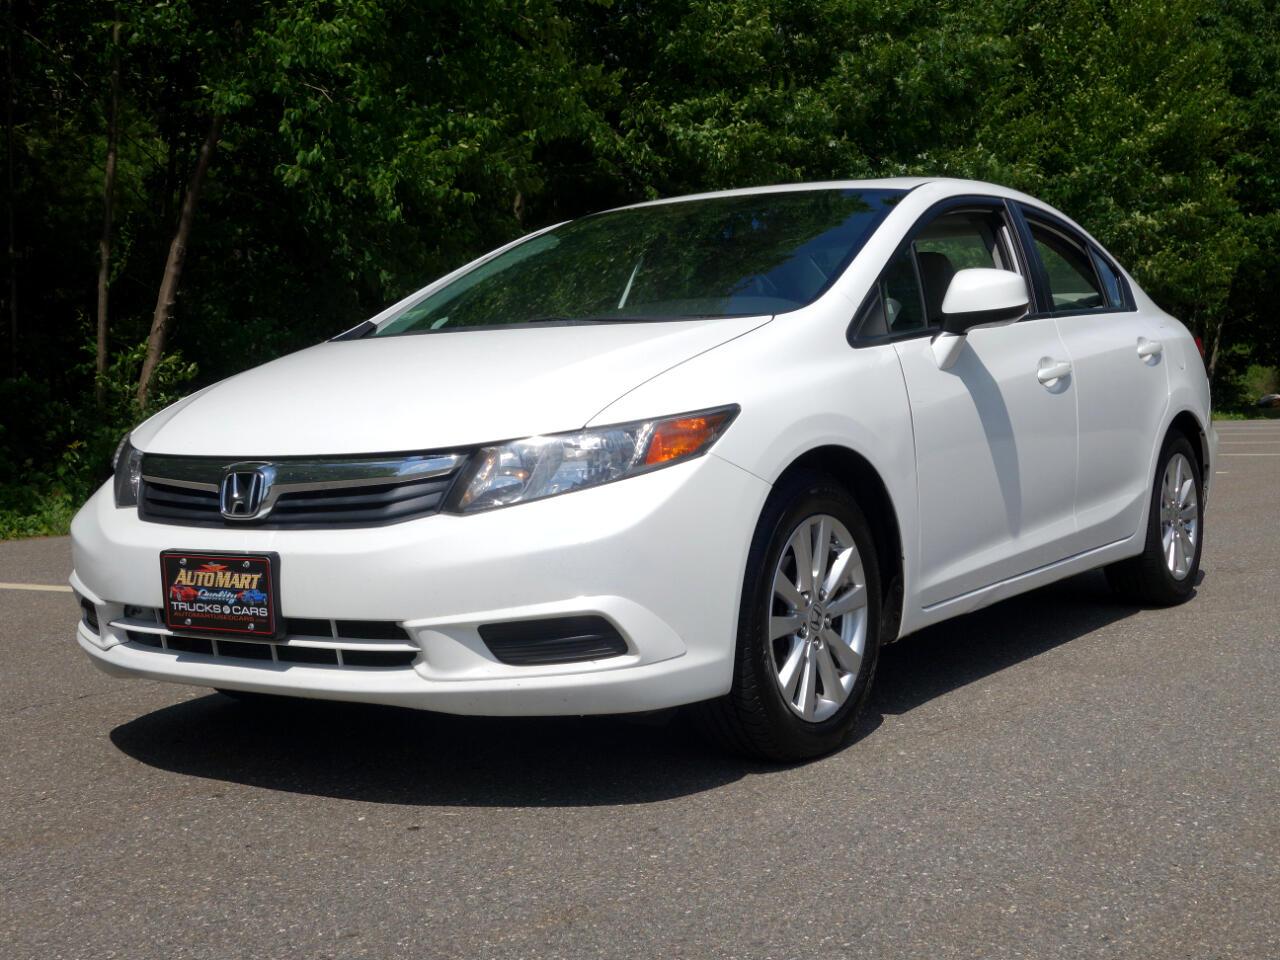 Honda Civic Sdn 4dr Auto EX-L 2012